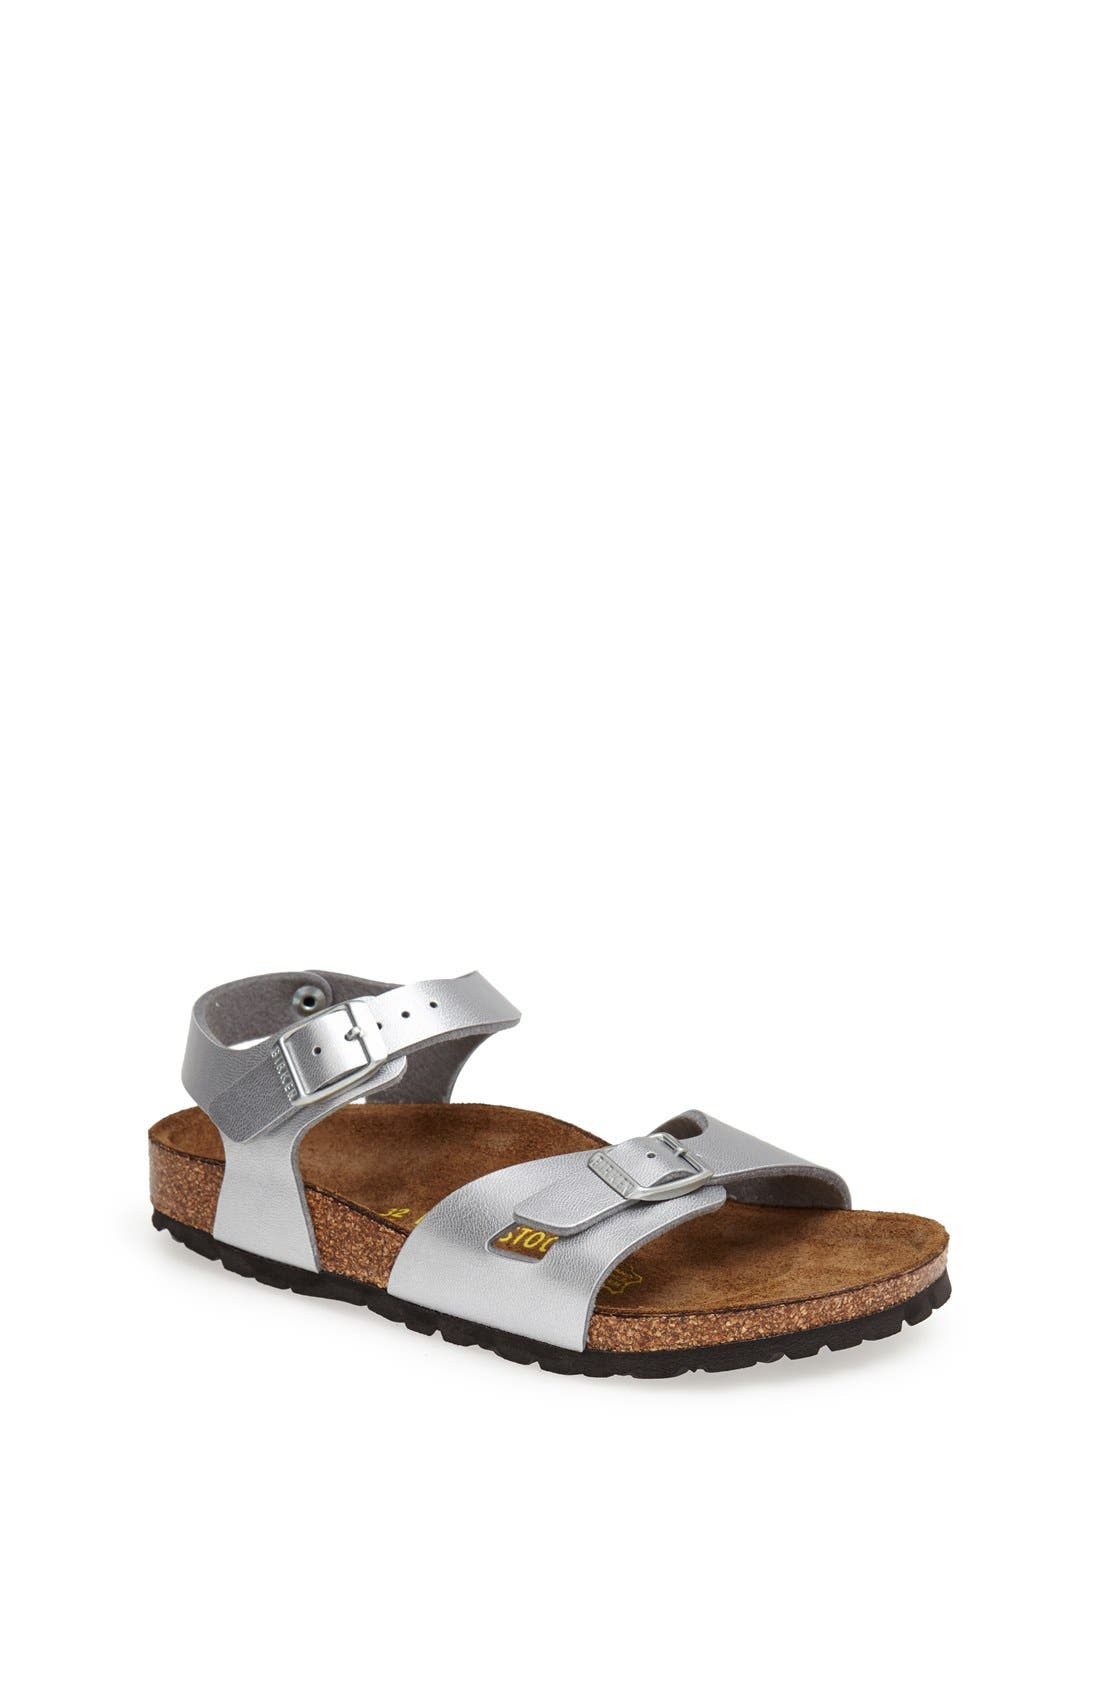 'Rio Birko-Flor<sup>™</sup>' Sandal, Main, color, 040